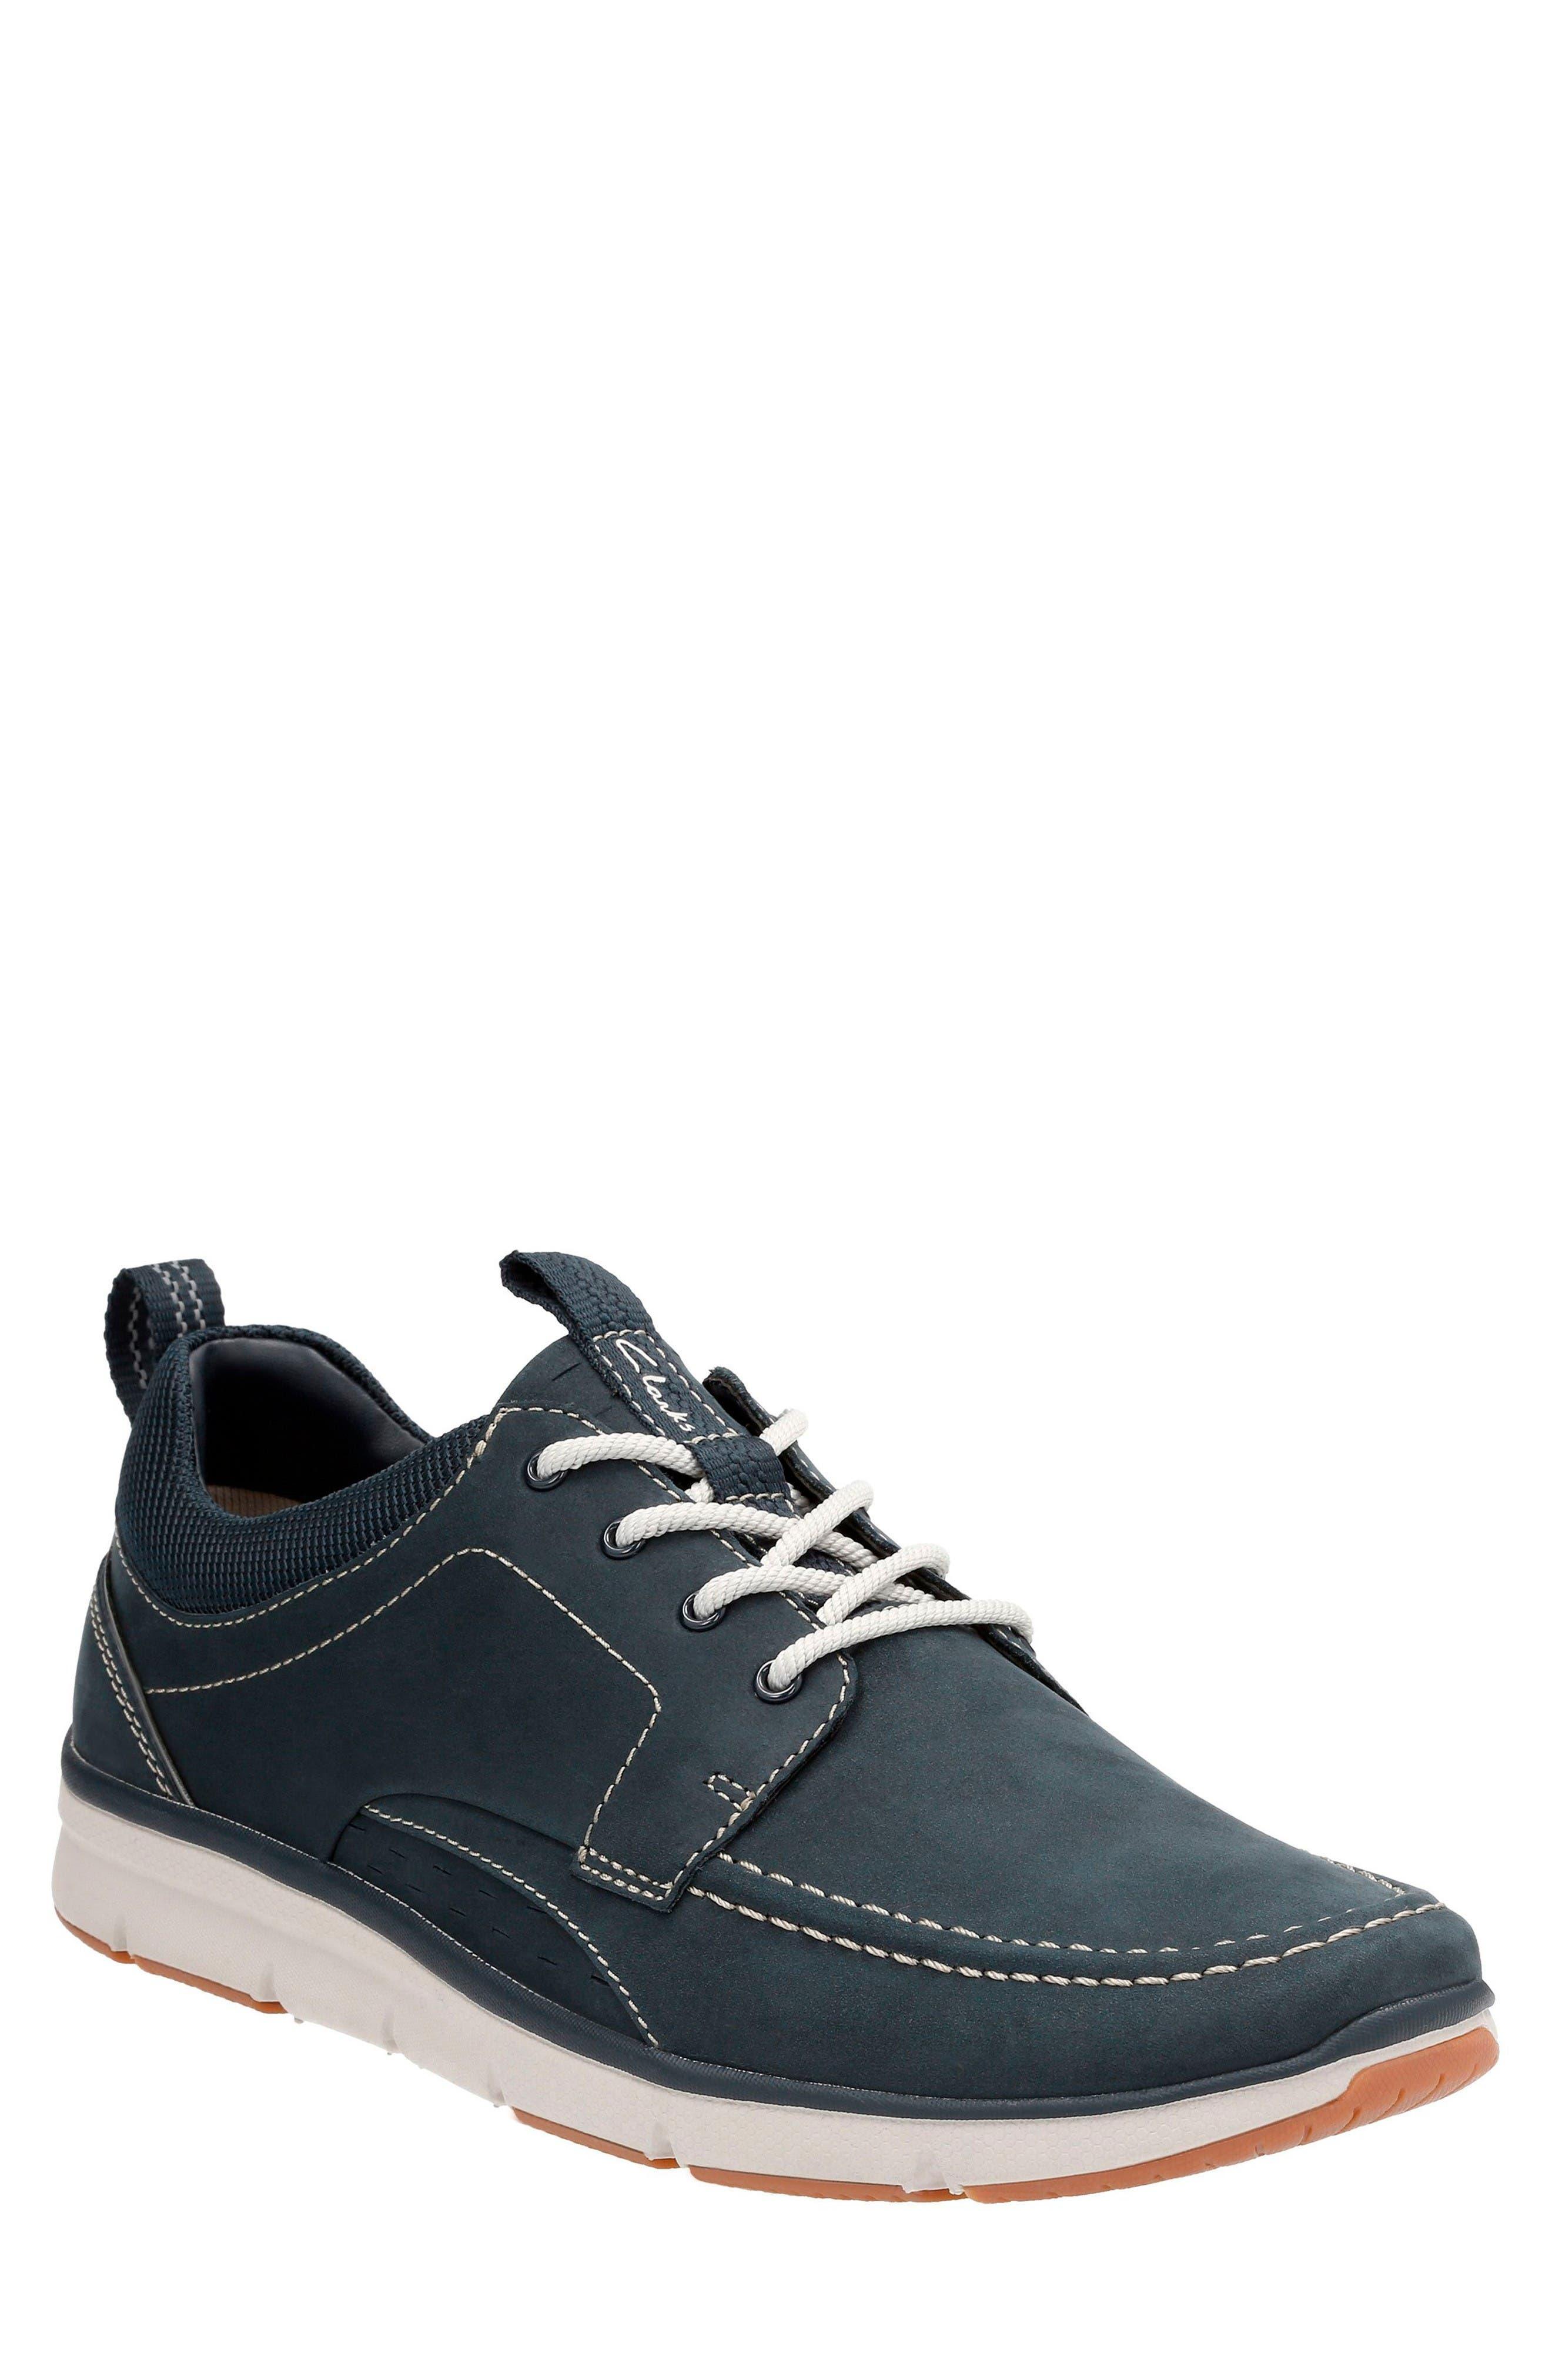 Clarks® Orson Bay Sneaker (Men)